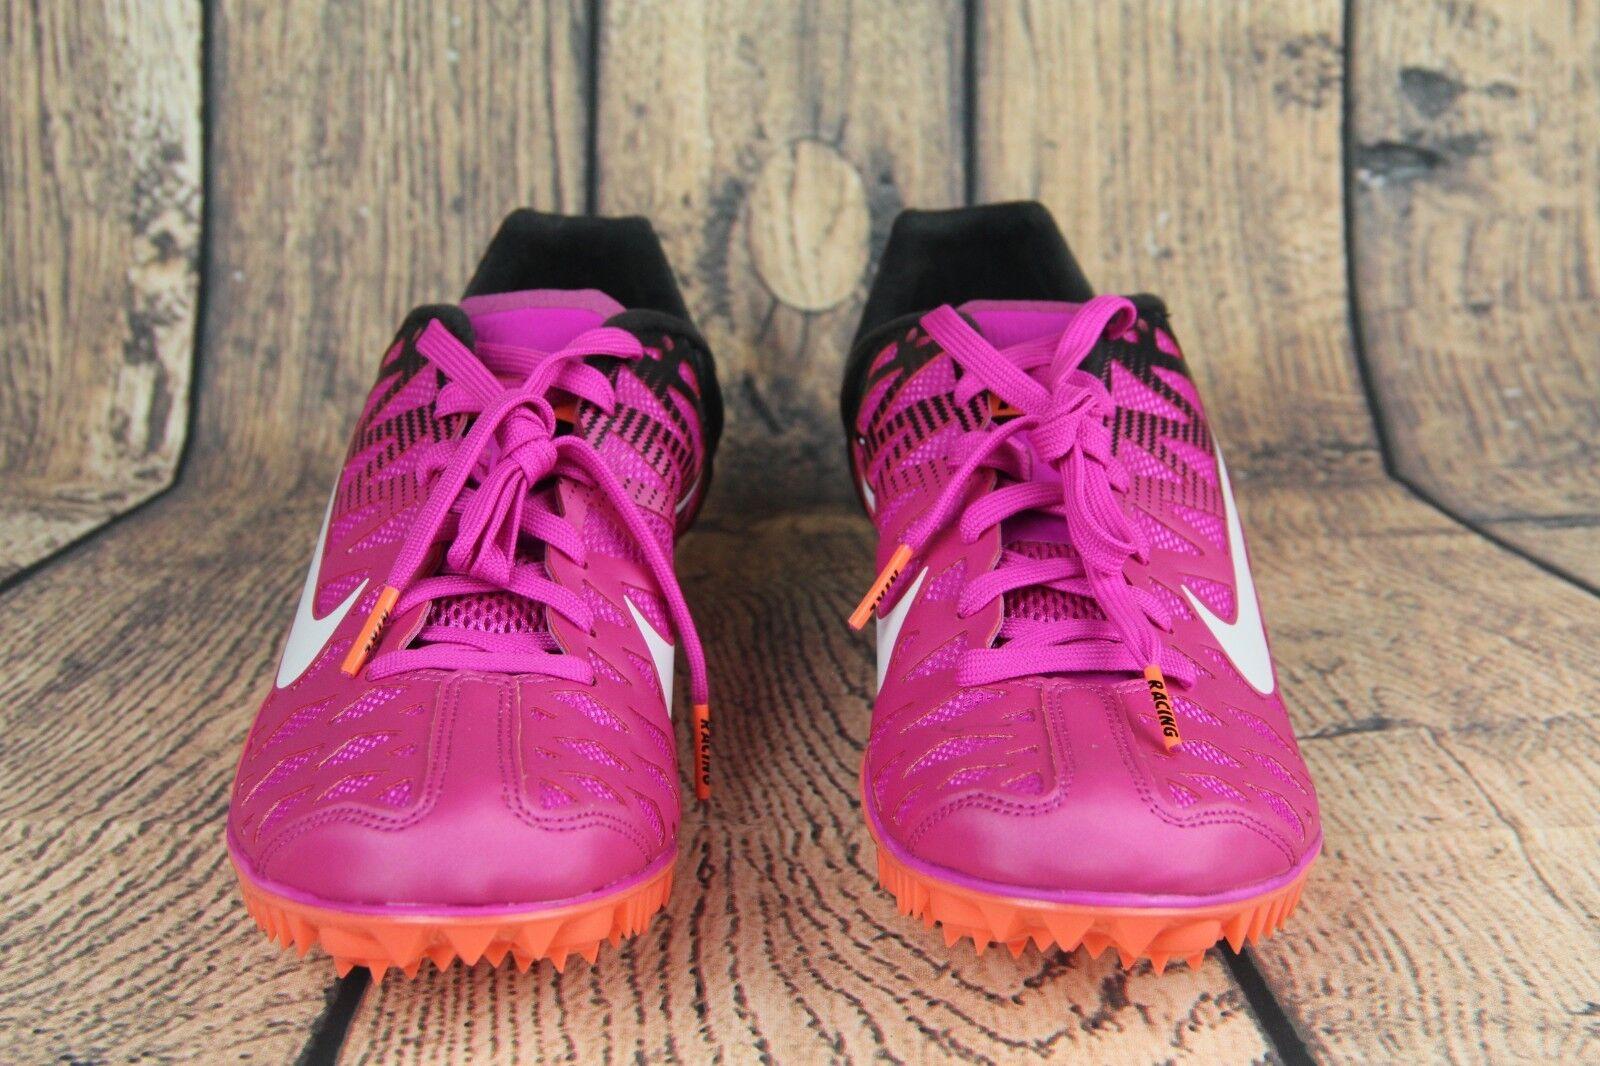 Nike zoom maxcat 4 spitzen schuhe feuer rosa schwarz 549150-601 mens größe 7